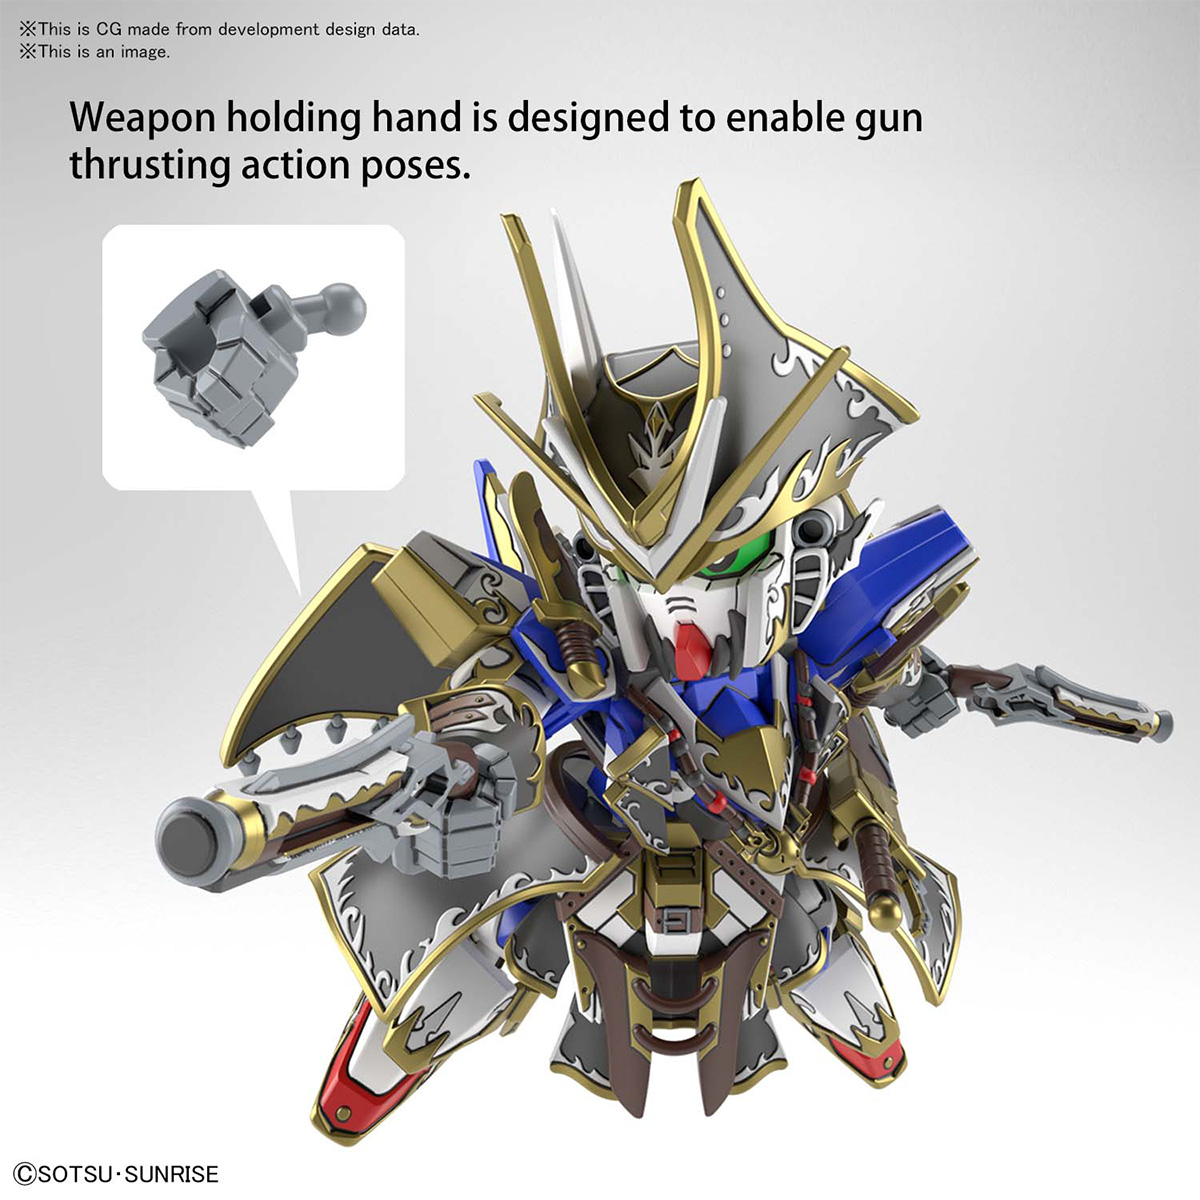 SD鋼彈世界 群英集 班傑明V2鋼彈